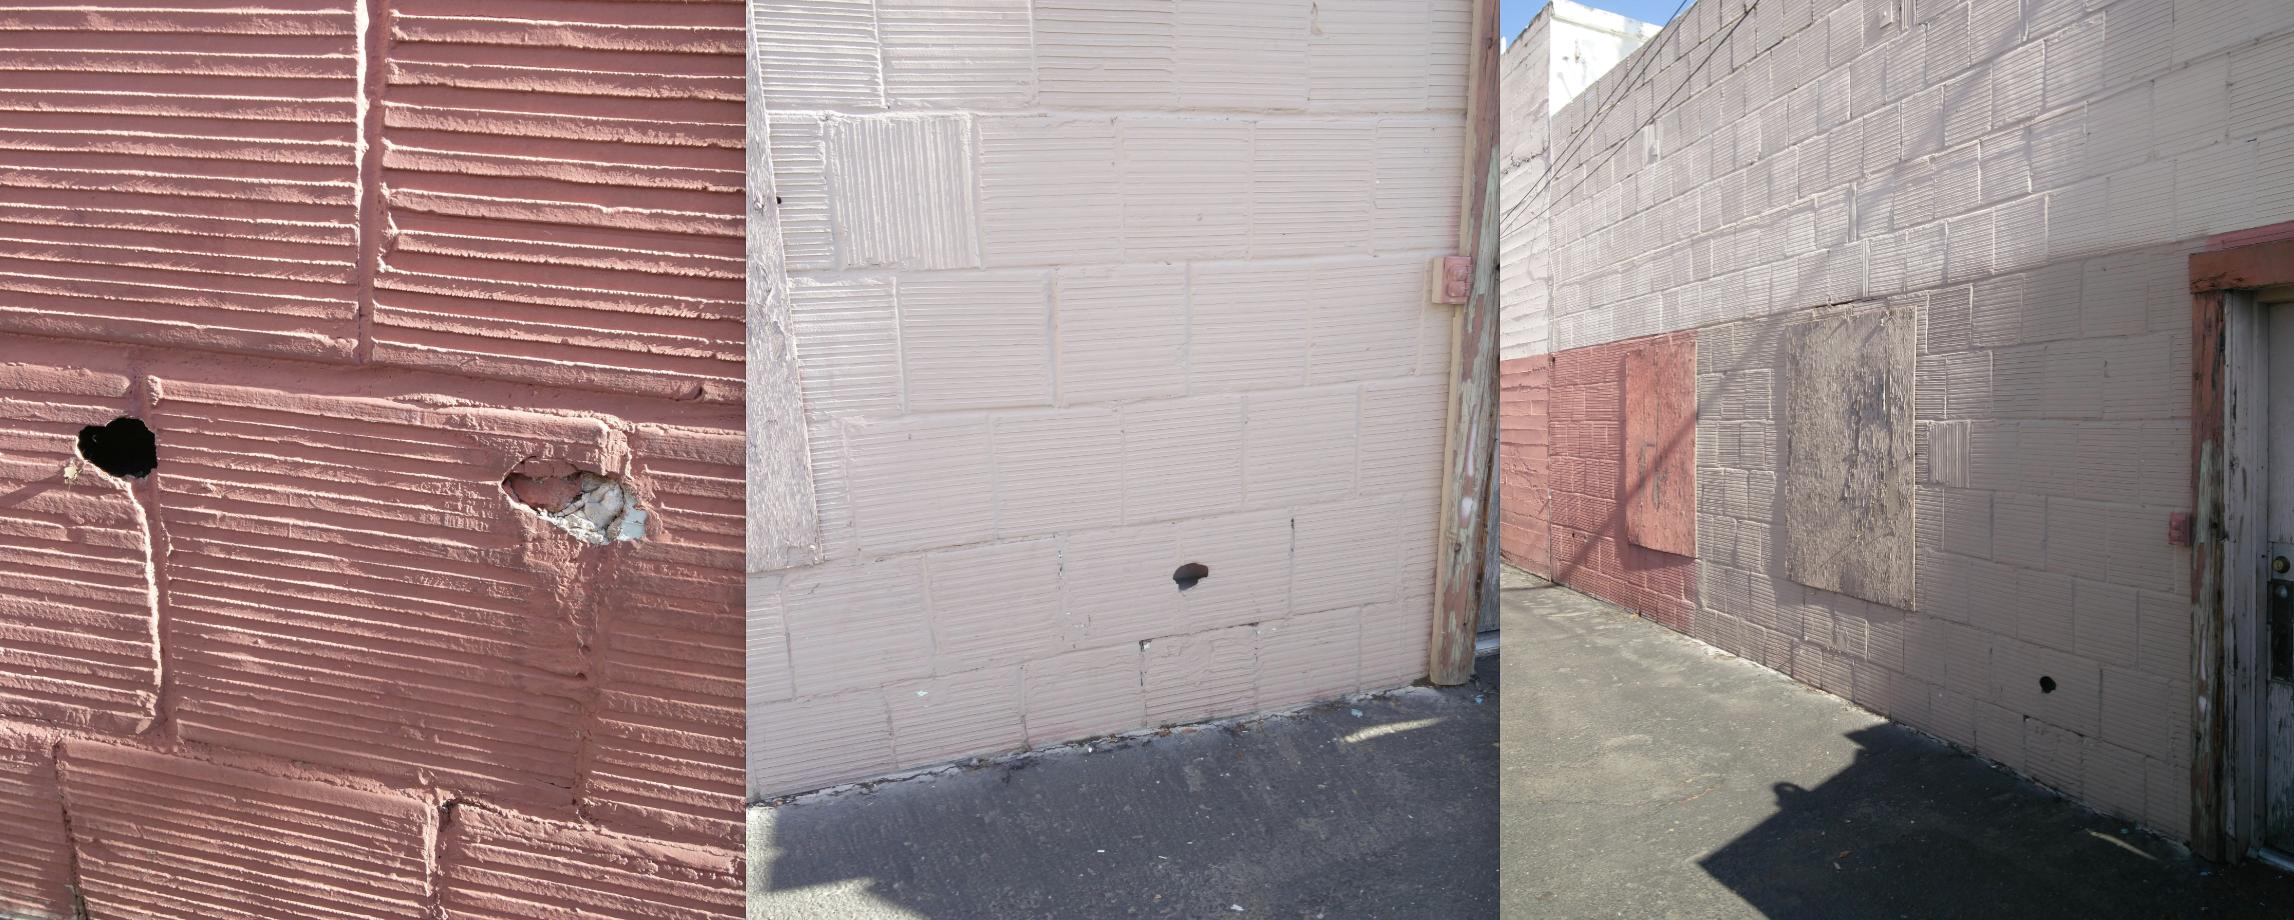 01-block-wall